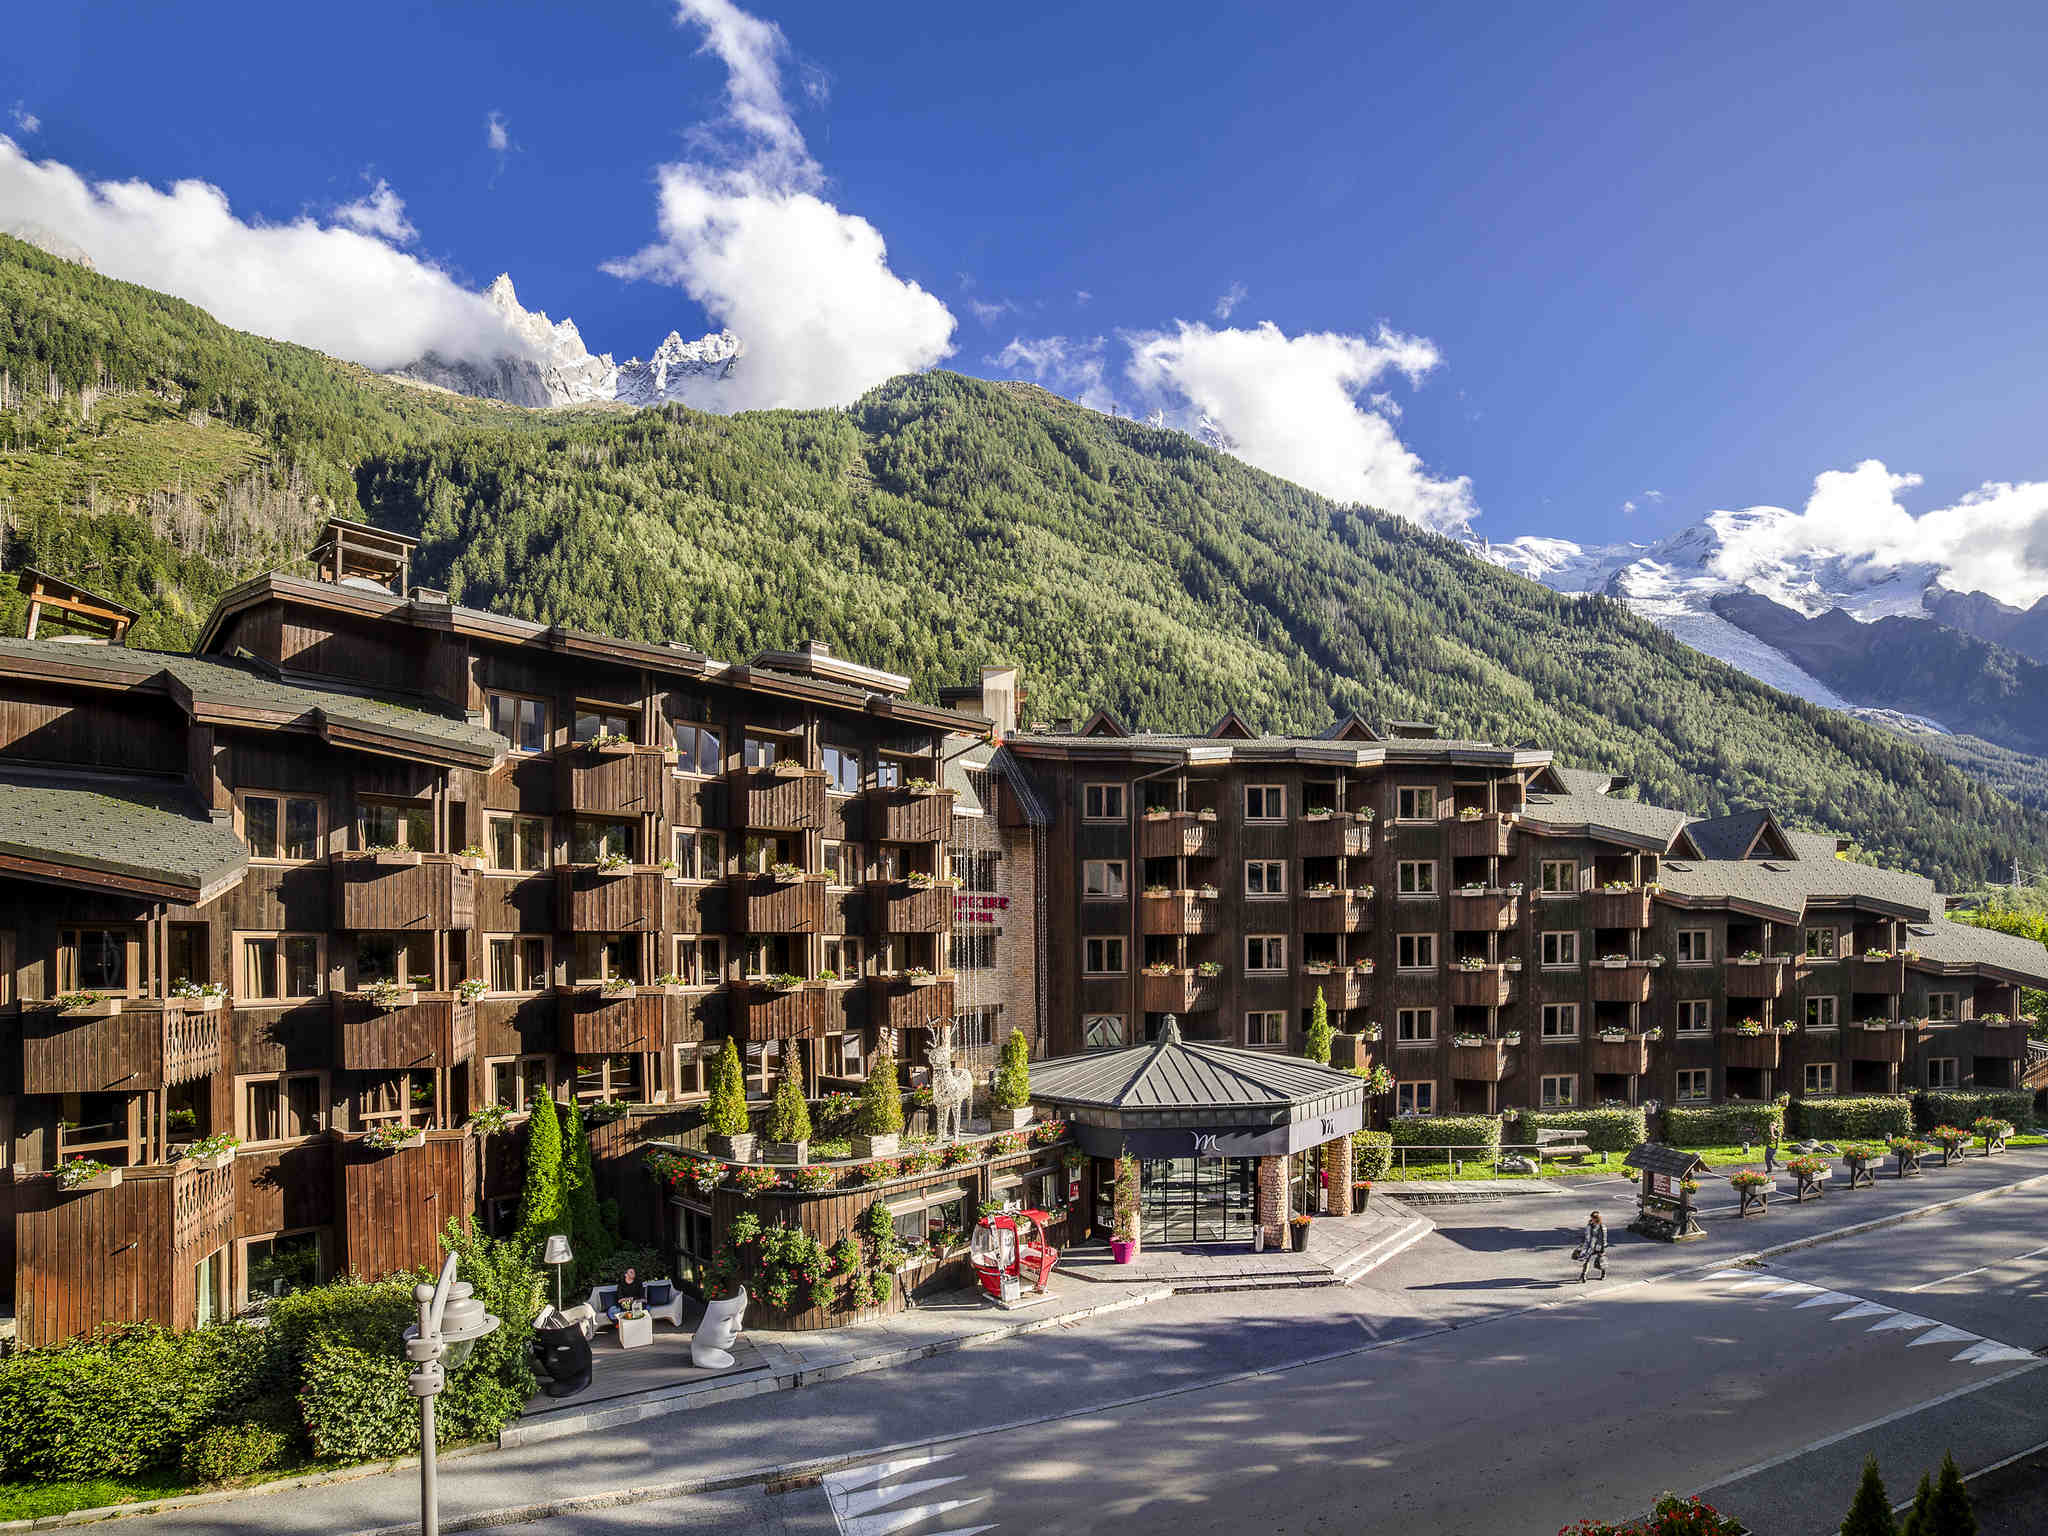 Hotel – Hotel Mercure Chamonix Centro